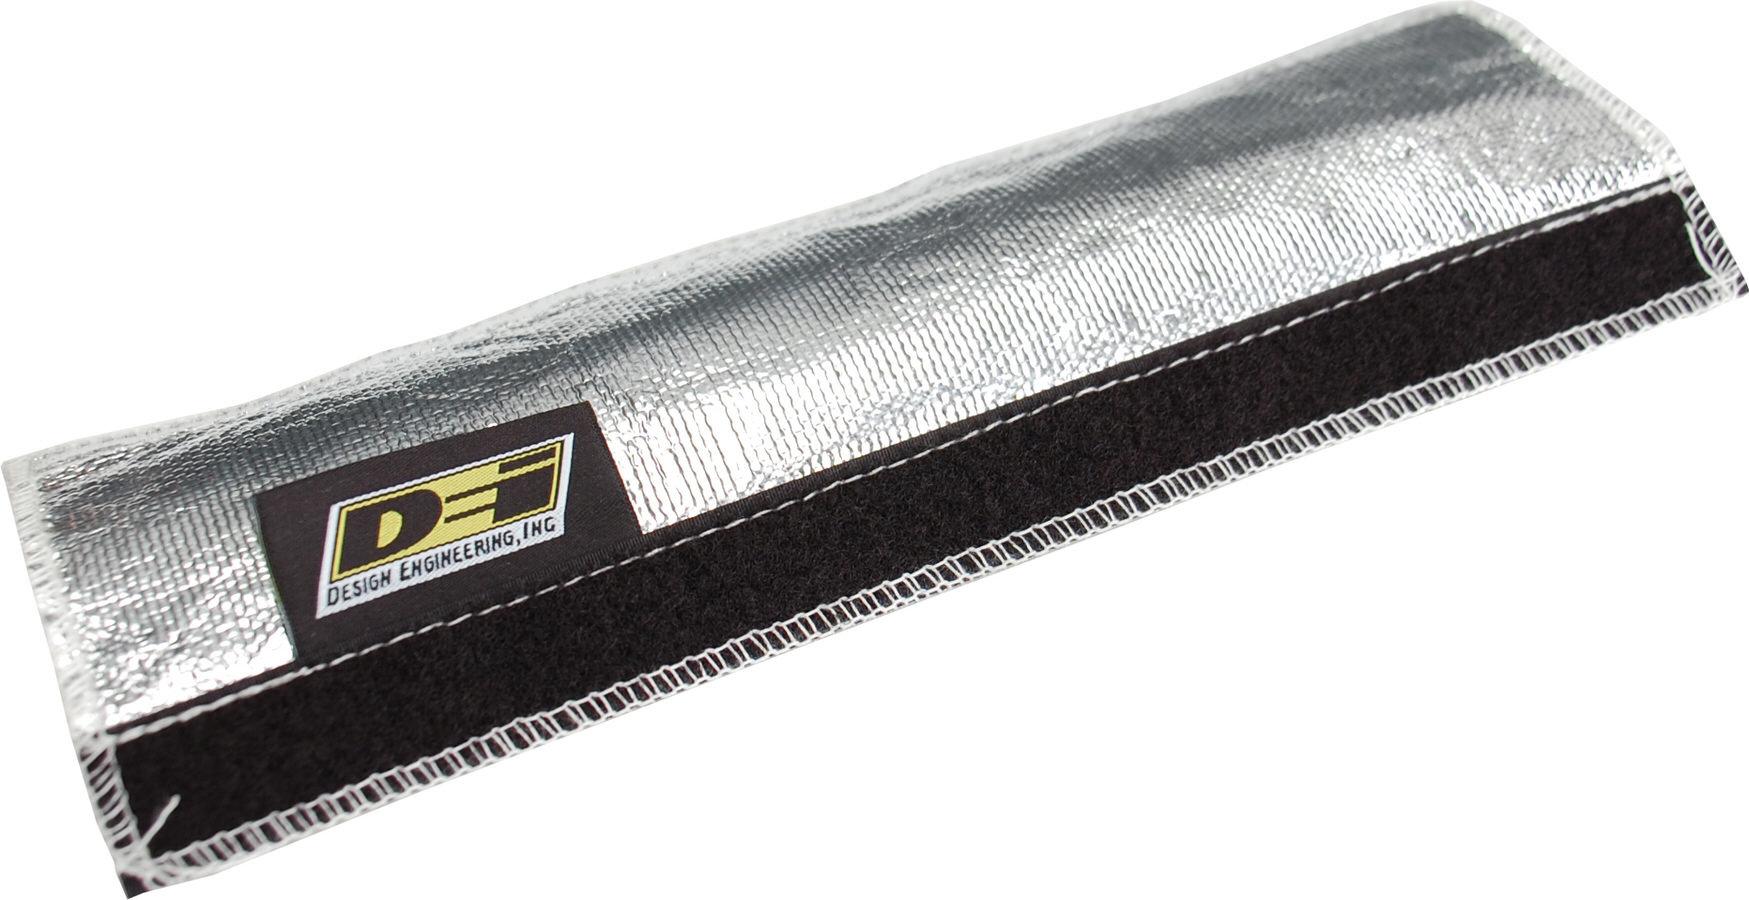 Design Engineering 85-88 Corvette EGR Pipe Heat Shield 11.5 x 4.5in